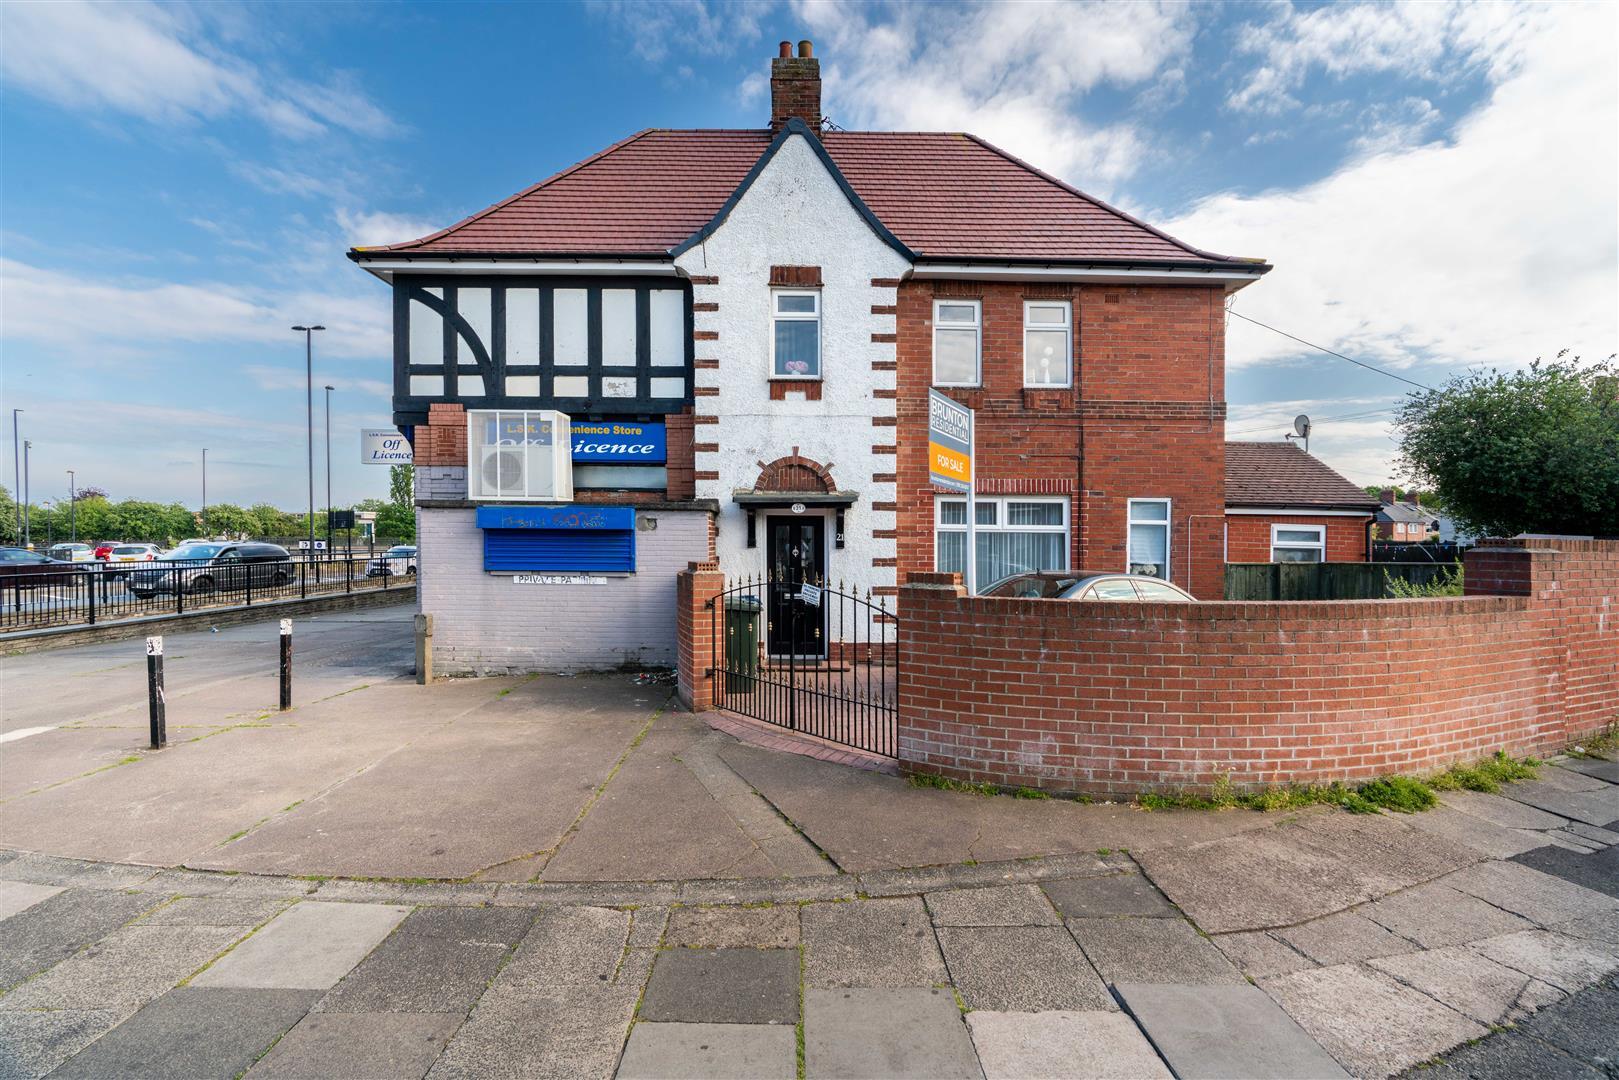 4 bed semi-detached house for sale in Benton Road, High Heaton, NE7